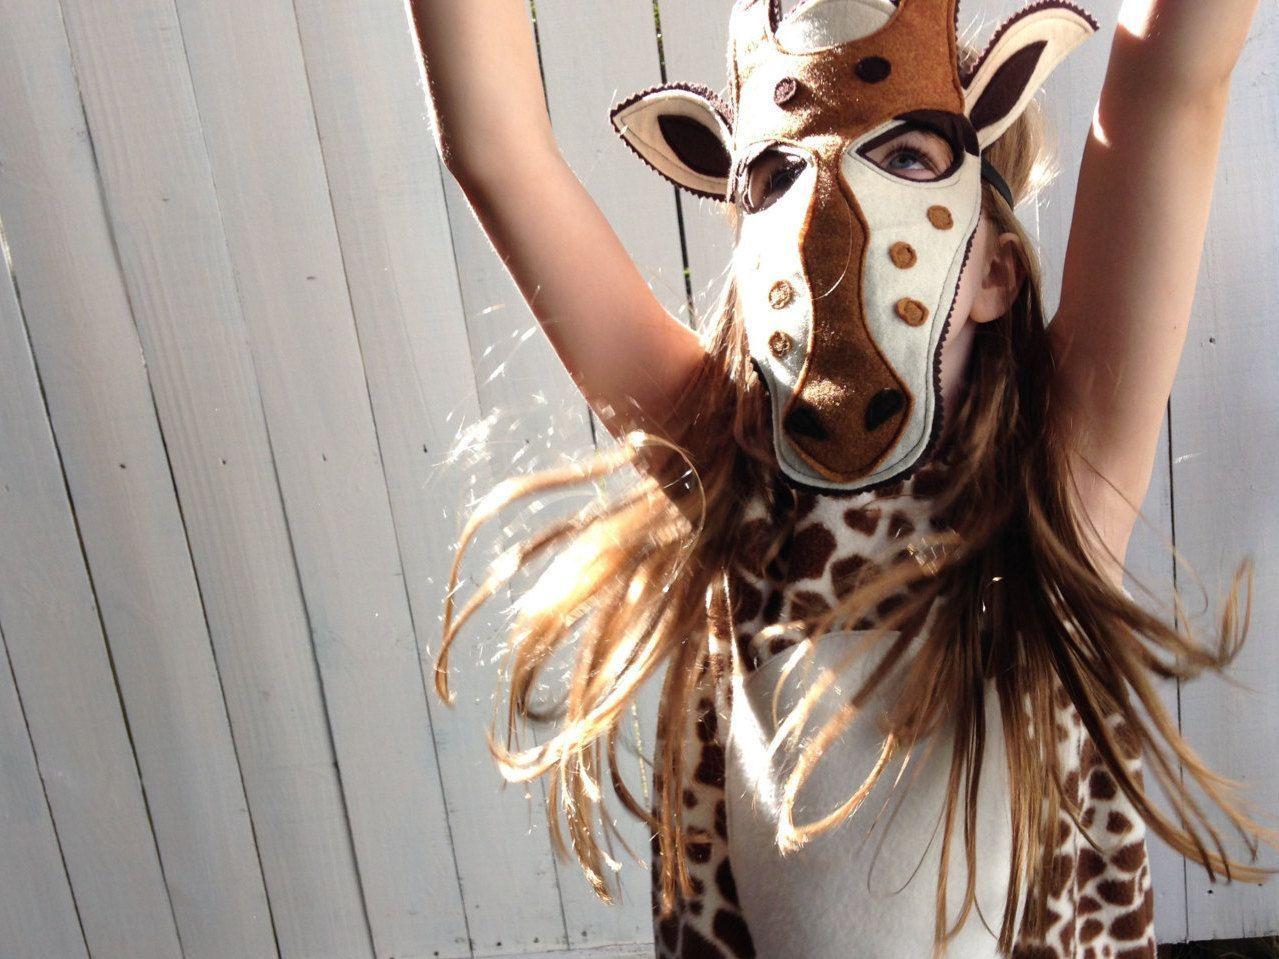 GIRAFFE Costume Vest, Fleece Vest by TheTreeHouseKid on Etsy #giraffecostumediy GIRAFFE Costume Vest, Fleece Vest by TheTreeHouseKid on Etsy #giraffecostumediy GIRAFFE Costume Vest, Fleece Vest by TheTreeHouseKid on Etsy #giraffecostumediy GIRAFFE Costume Vest, Fleece Vest by TheTreeHouseKid on Etsy #giraffecostumediy